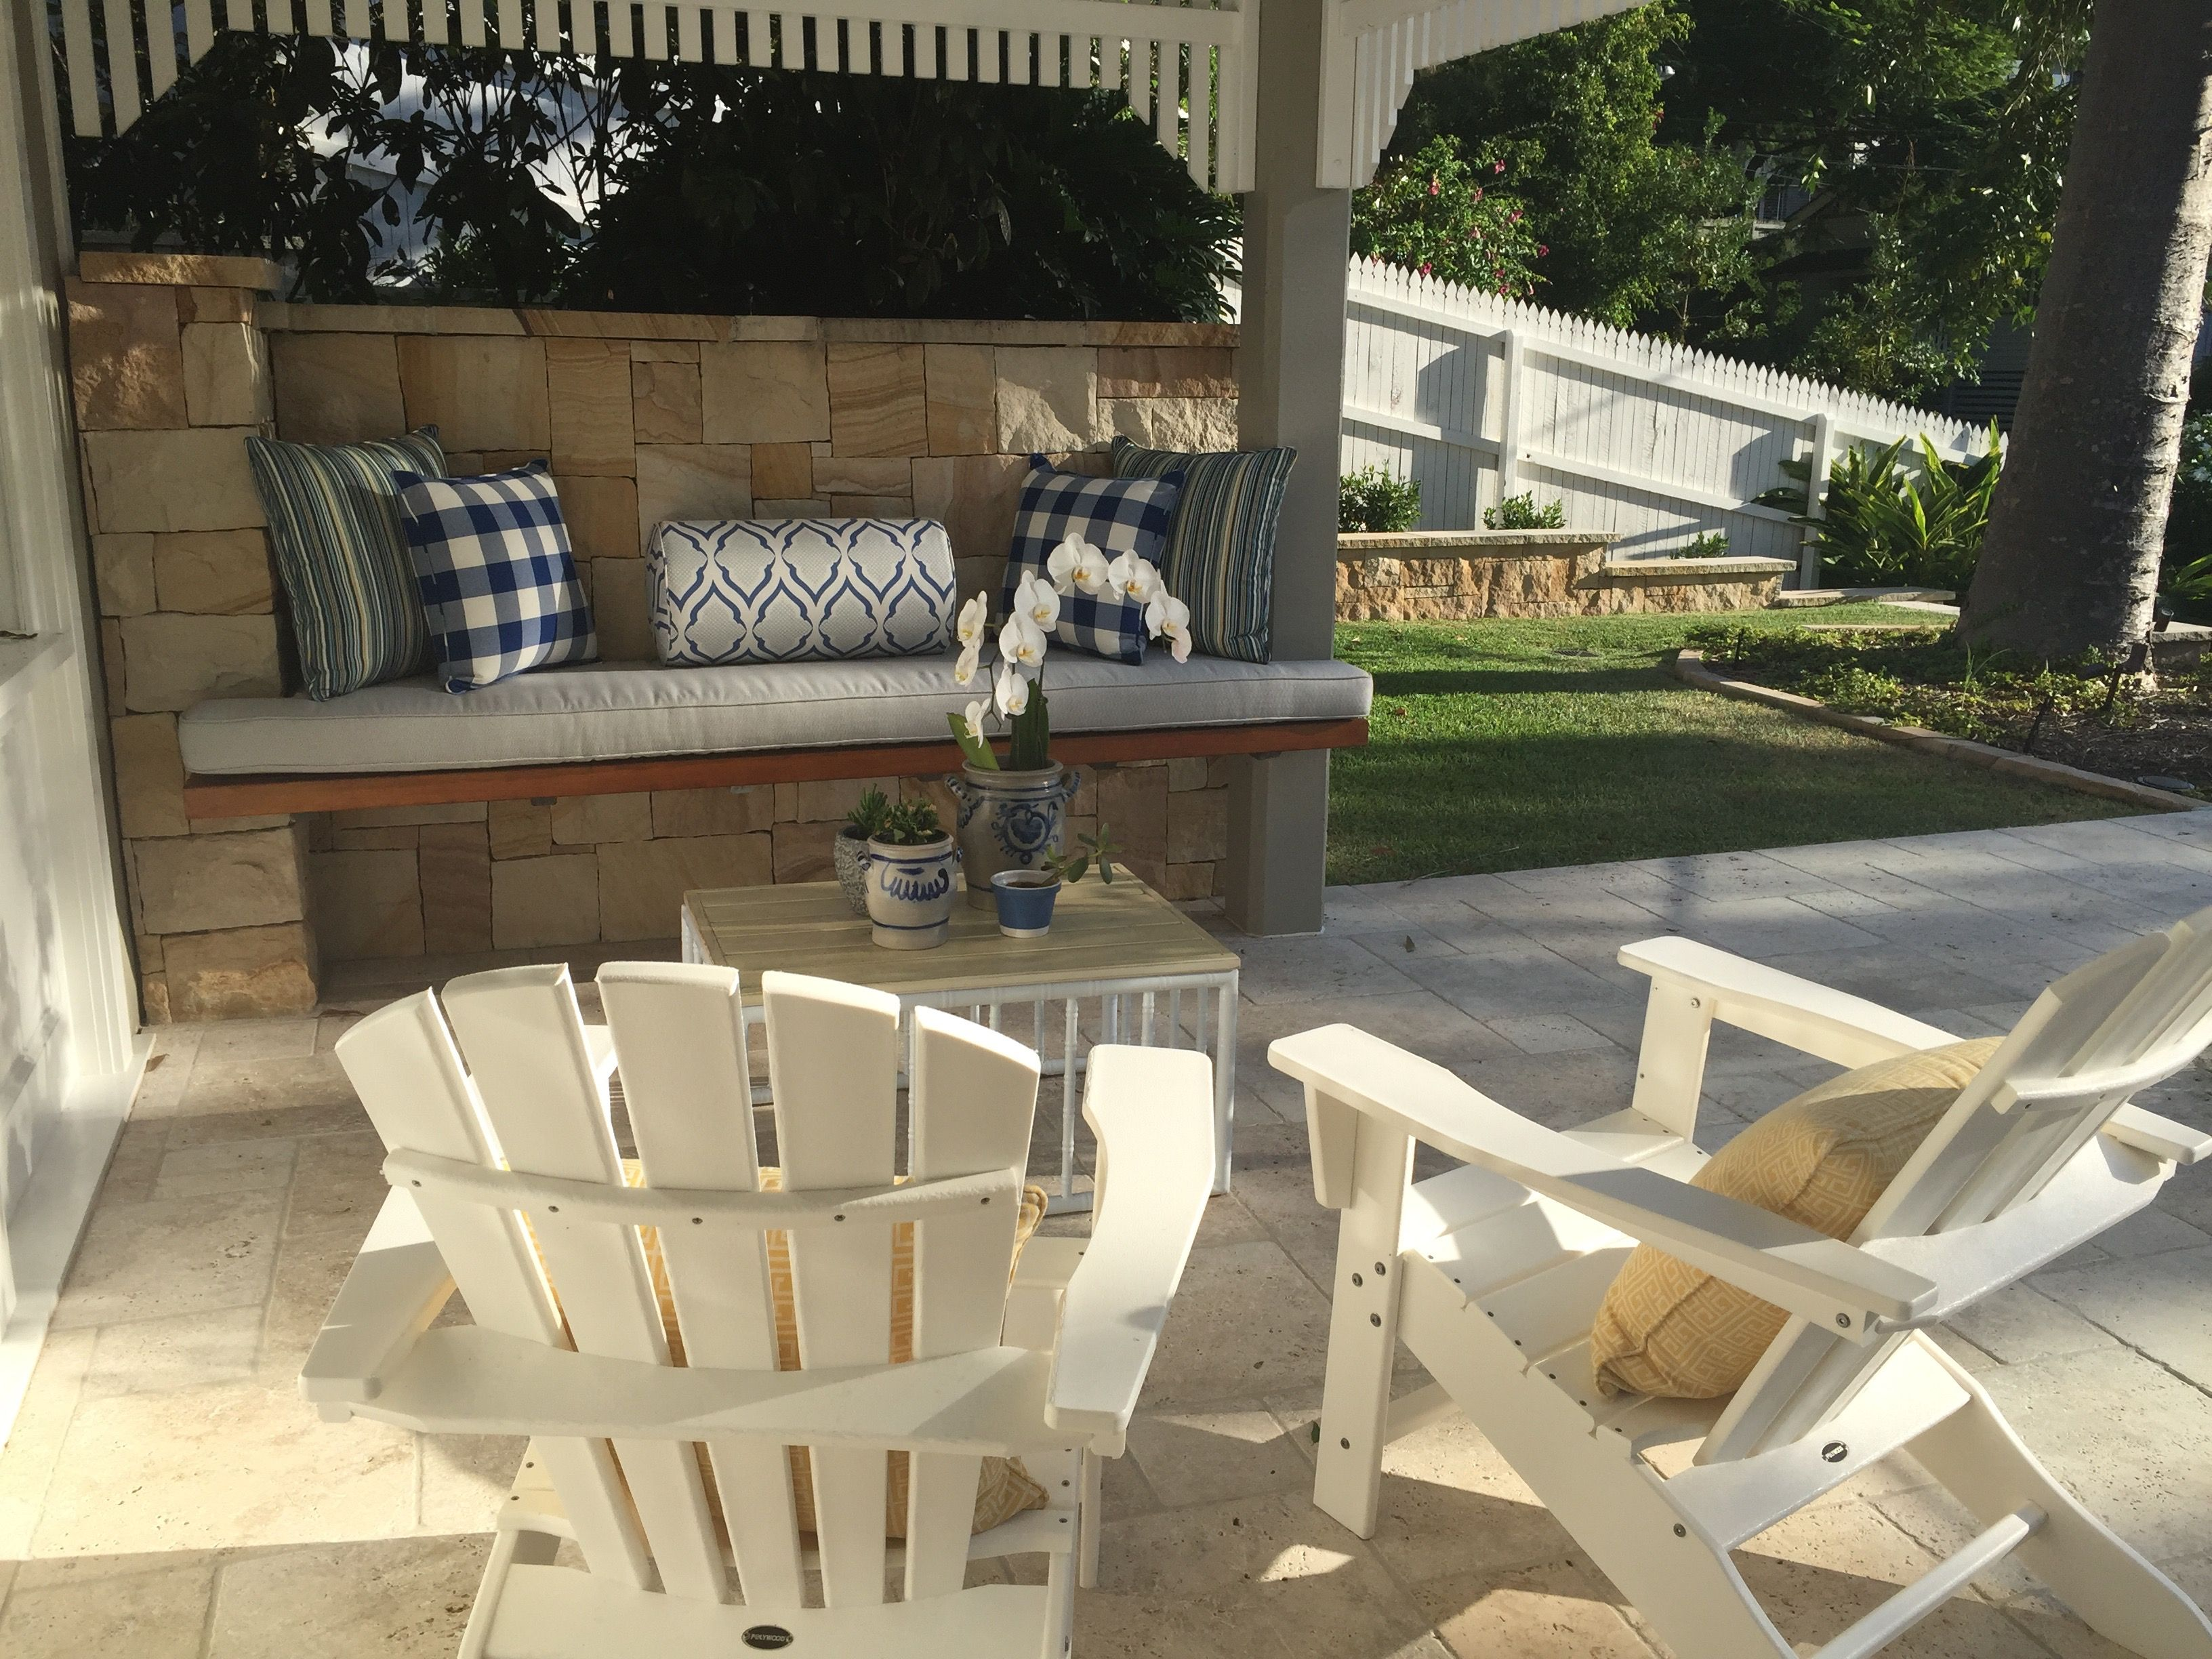 Towoong Garden designed by My Verandah - Seating/sandstone ...